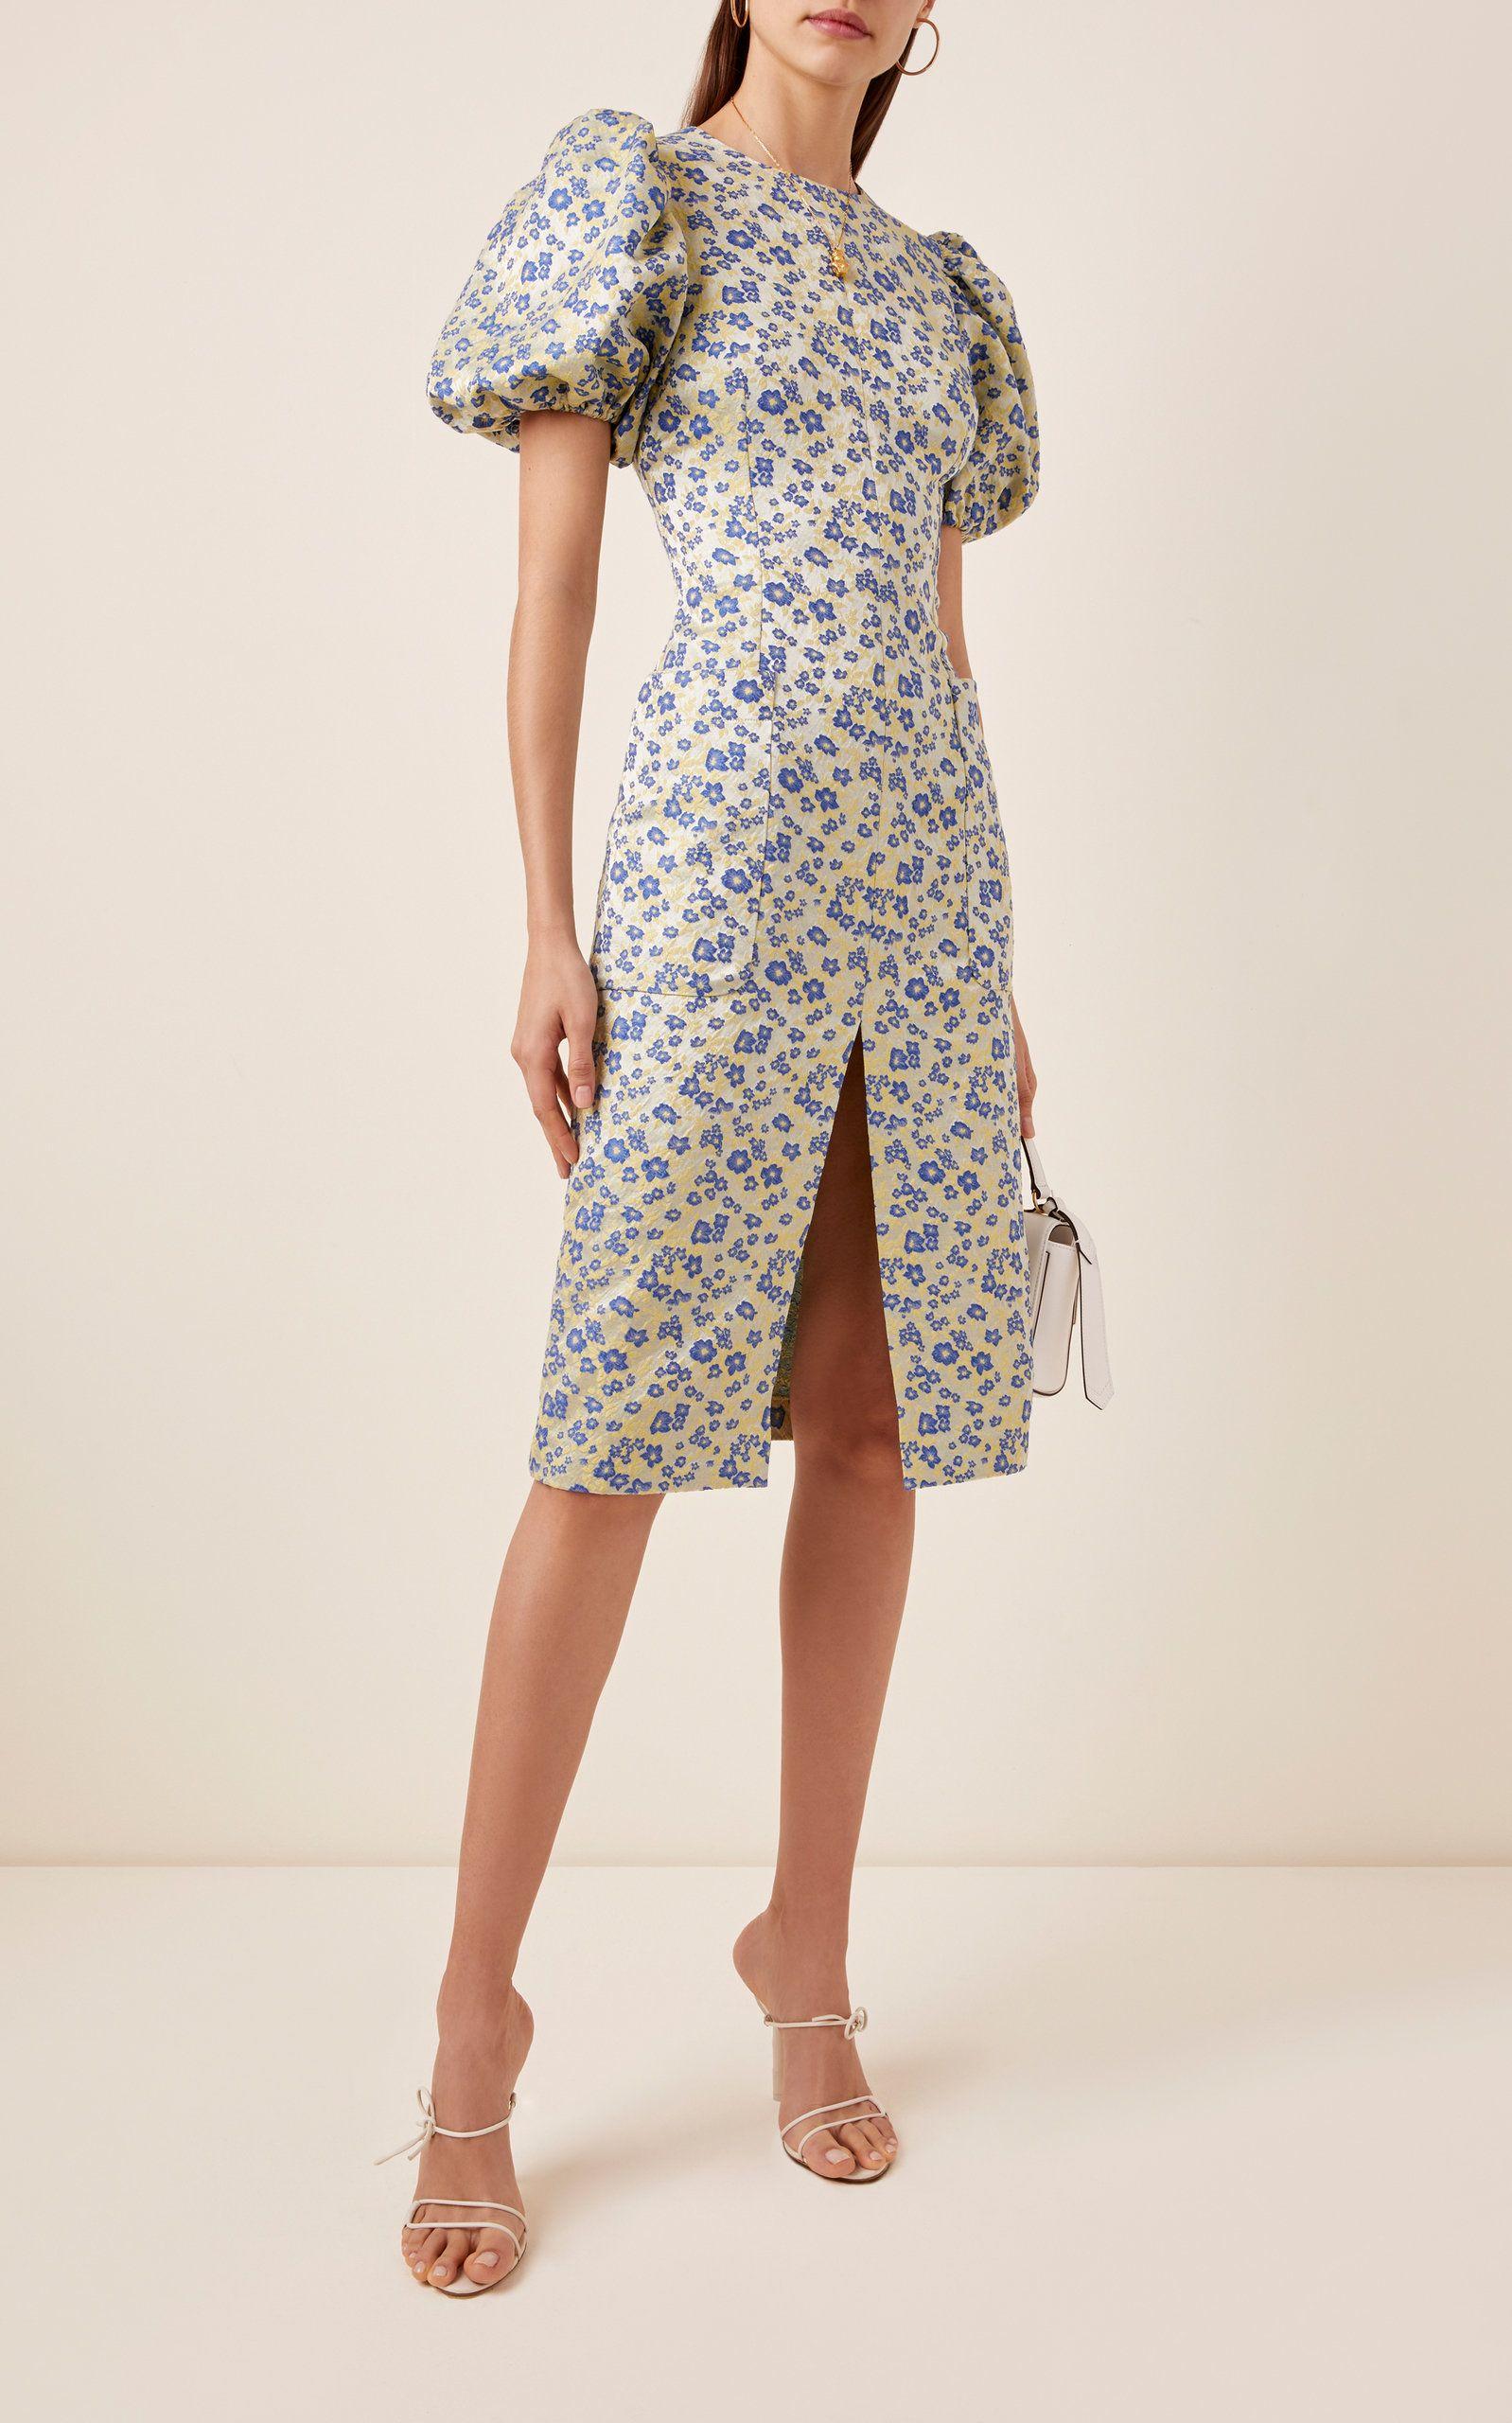 Rotate Katarina Satin Midi Dress Satin Midi Dress Vintage Midi Dresses Fashion [ 2560 x 1598 Pixel ]